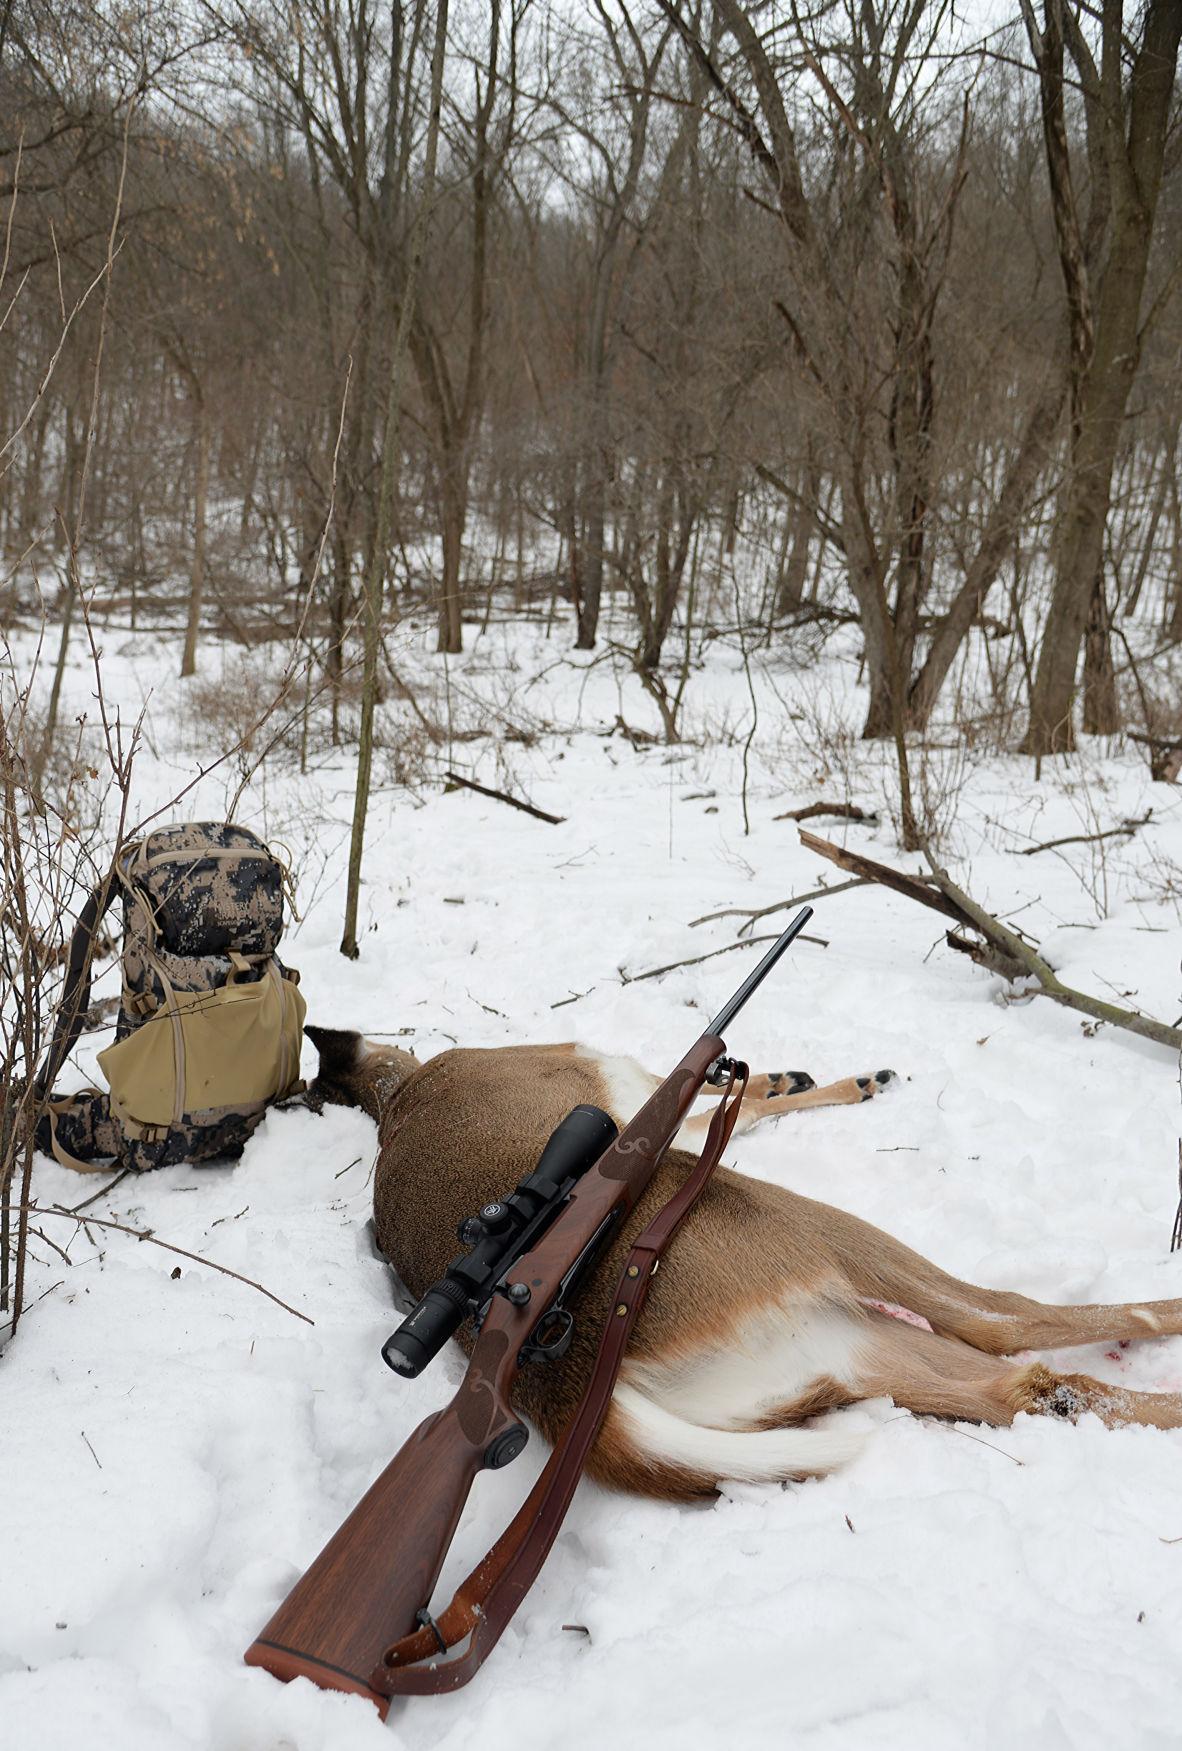 Deer and CWD